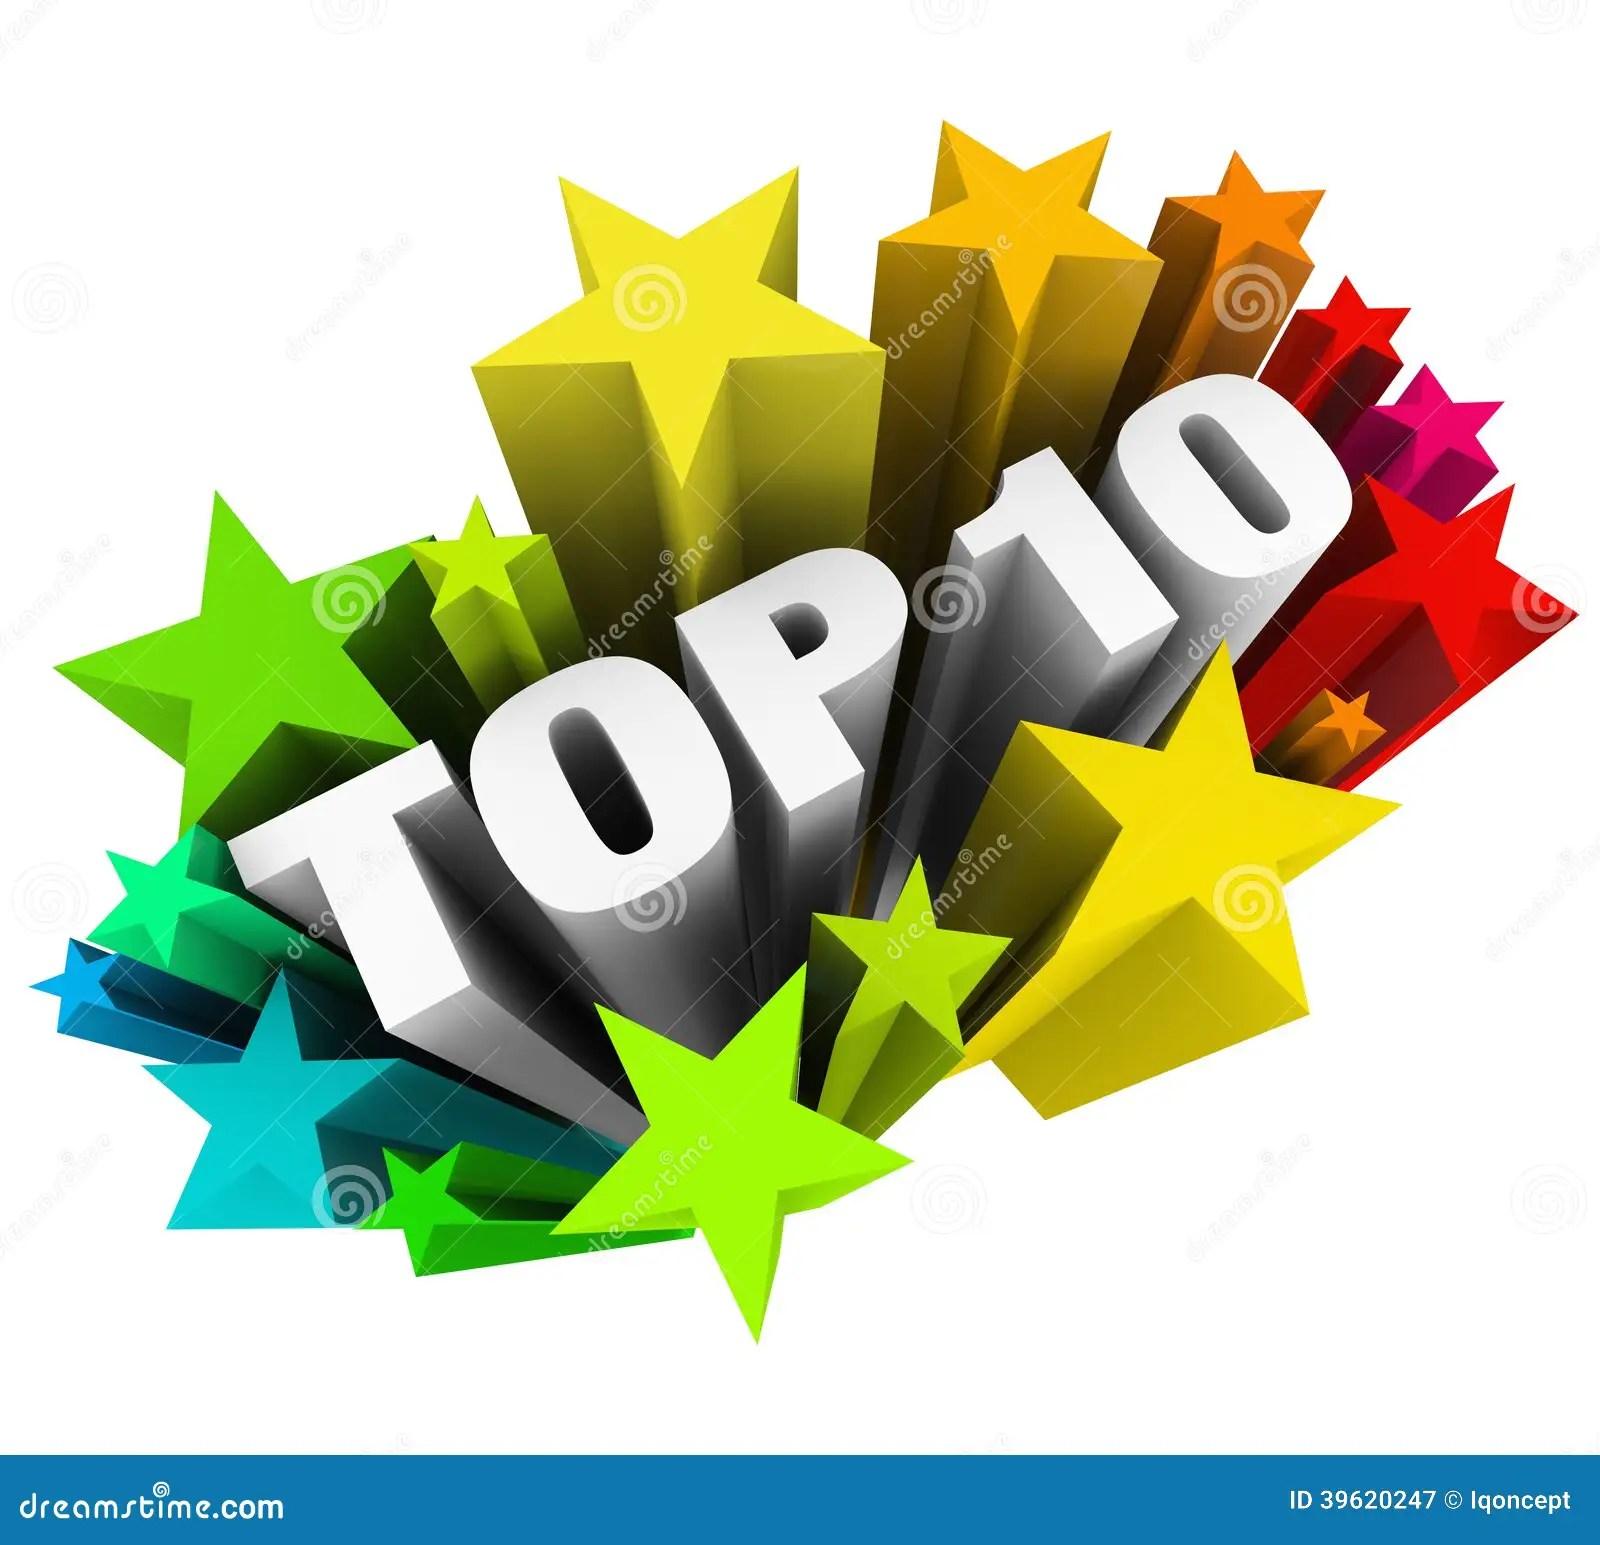 Top 10 Ten Stars Celebrate Best Review Rating Award Stock